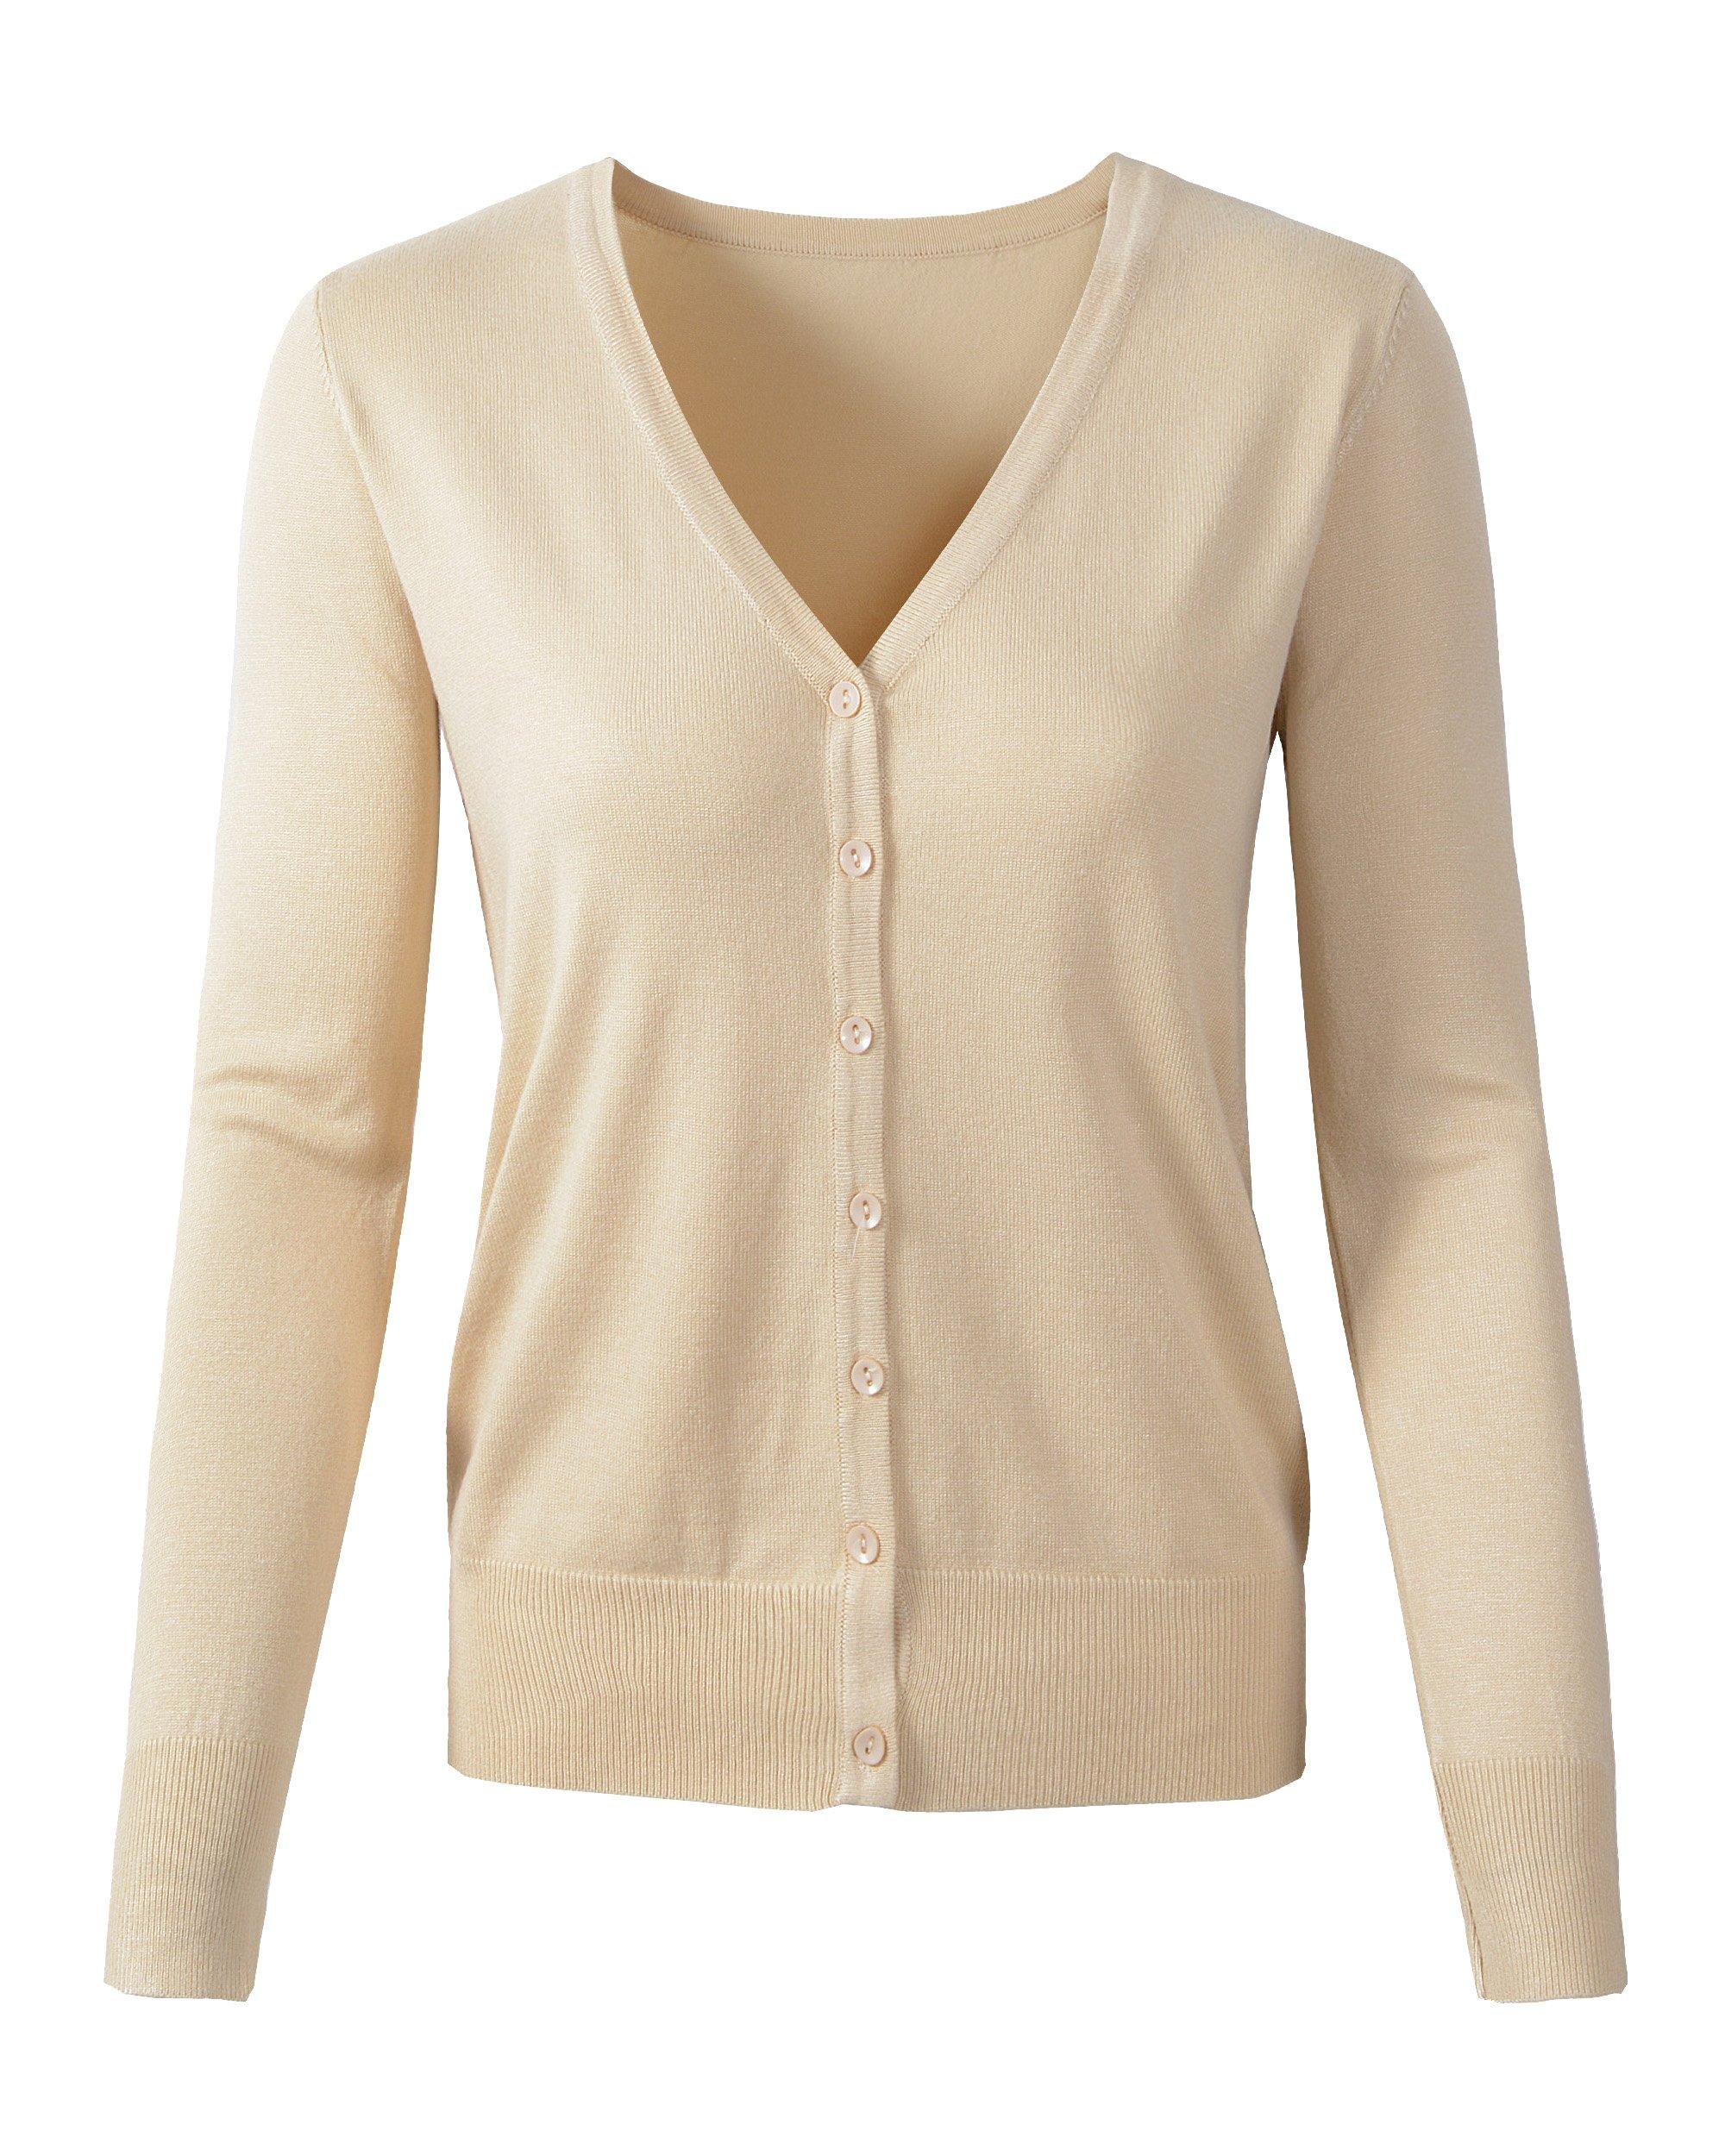 Womens V Neck Button Down Long Sleeve Basic Soft Knit Cardigan Sweater (US Large/Tag 2XL, 135Khaki) by Benibos (Image #1)